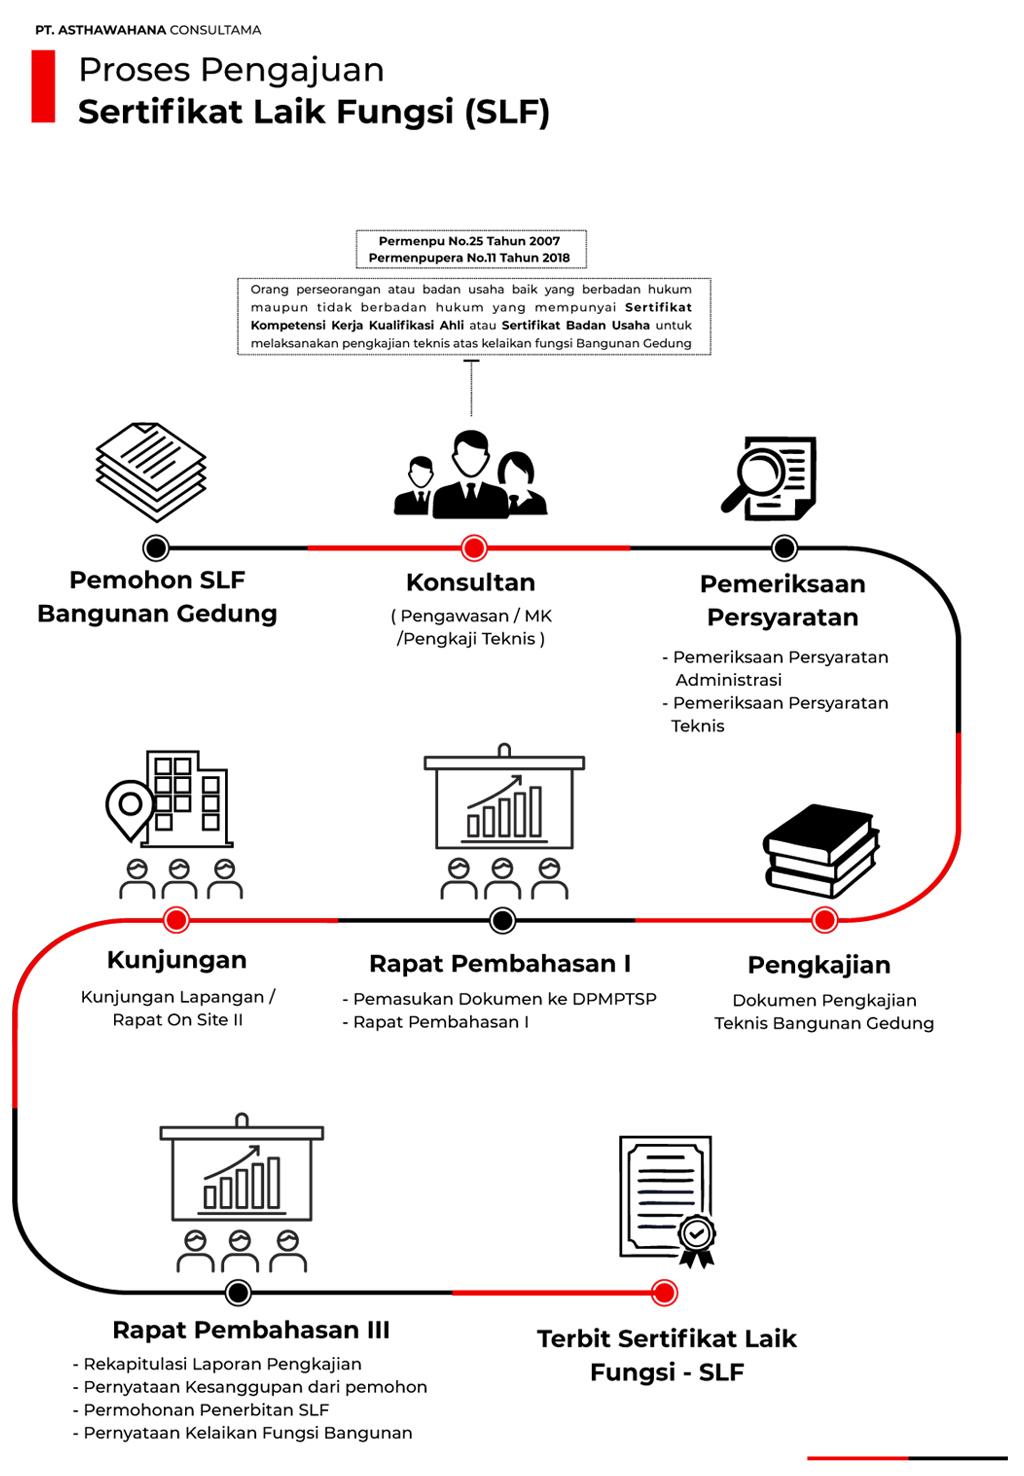 Proses Pengajuan SLF Sertifikat Laik Fungsi - Jasa Pembuatan SLF